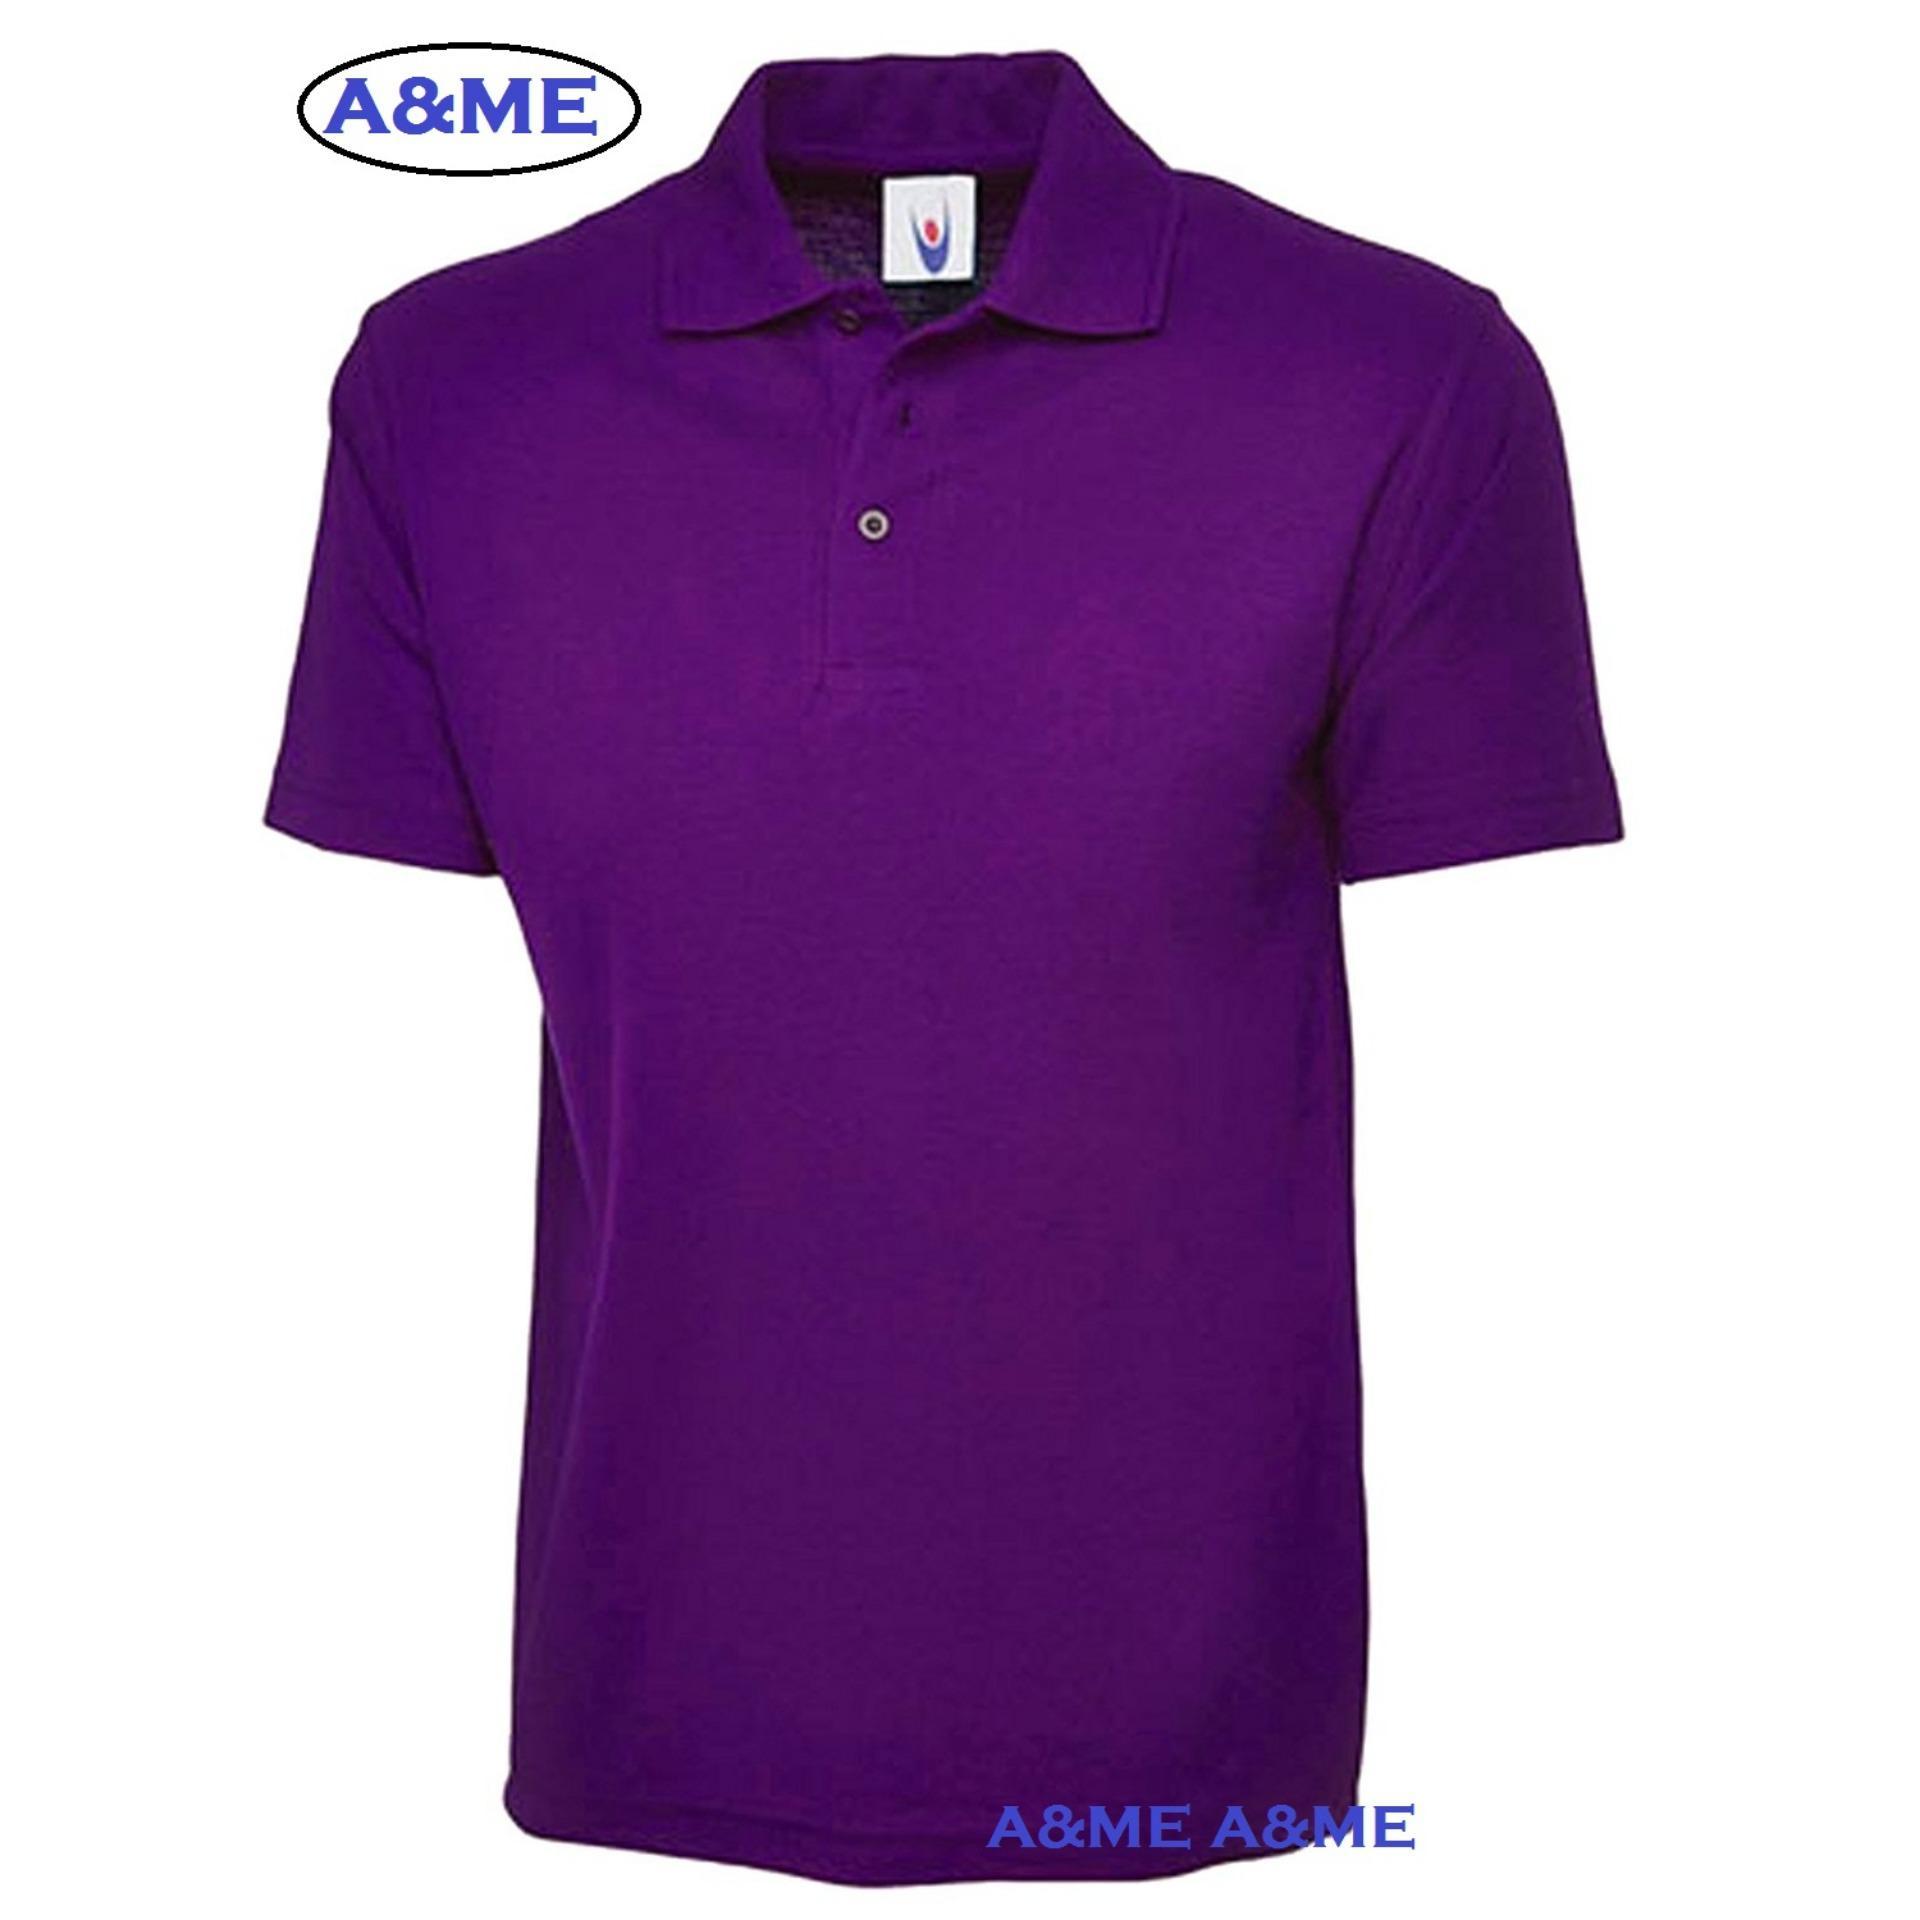 A Me Kaos Polo Shirt M L Xl Lengan Pendek Baju Pakaian Olah Raga Kaos Kerah Atasan Pria Wanita Lacos Pique Fashion Keren Nyaman Bagus Simple Ungu A Me Diskon